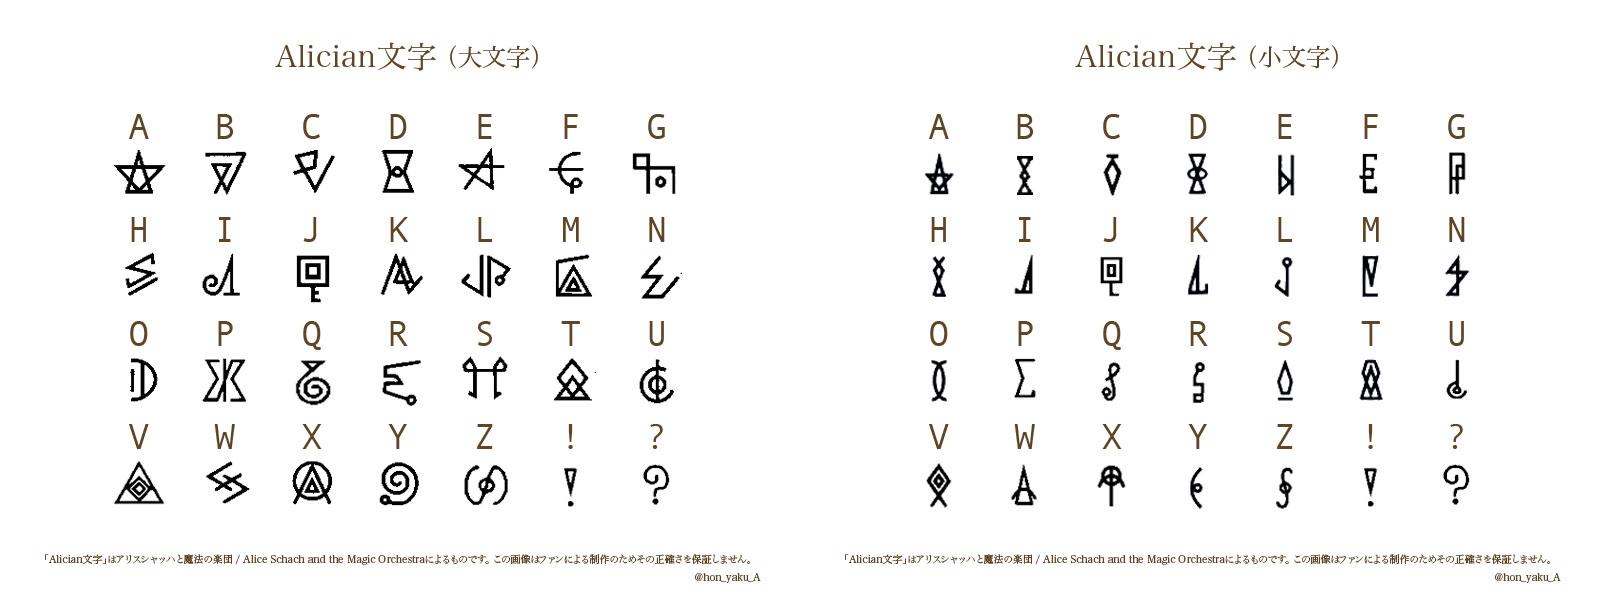 Alician-Alphabet